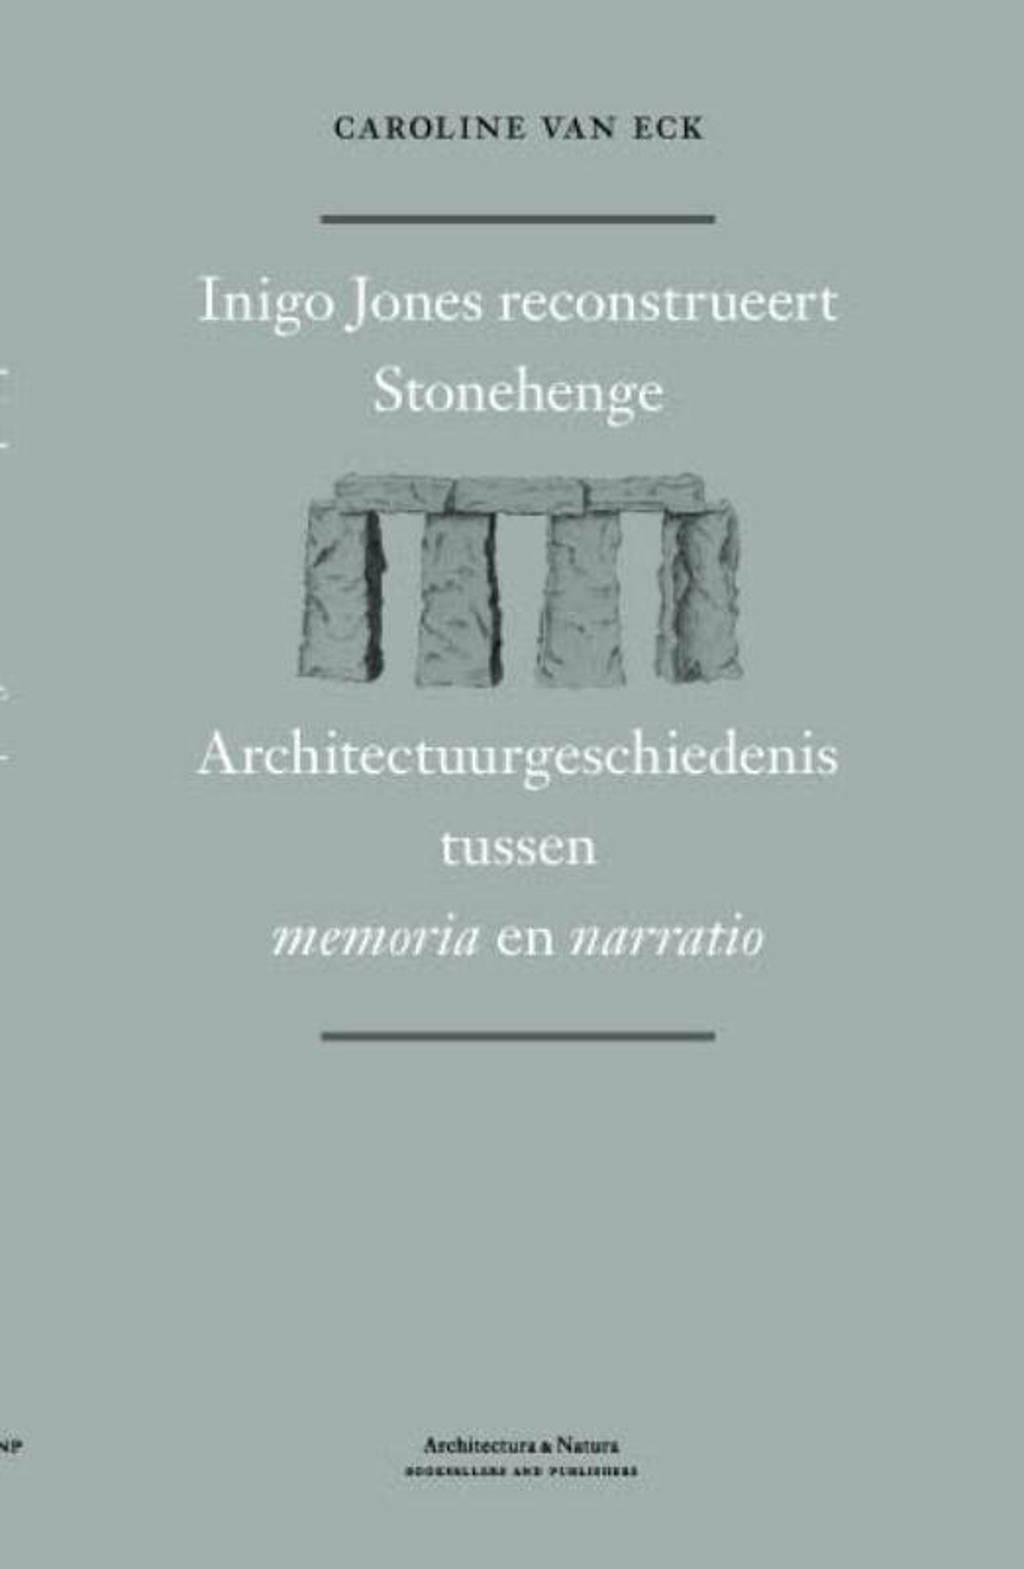 Inigo Jones on Stonehenge - Caroline van Eck